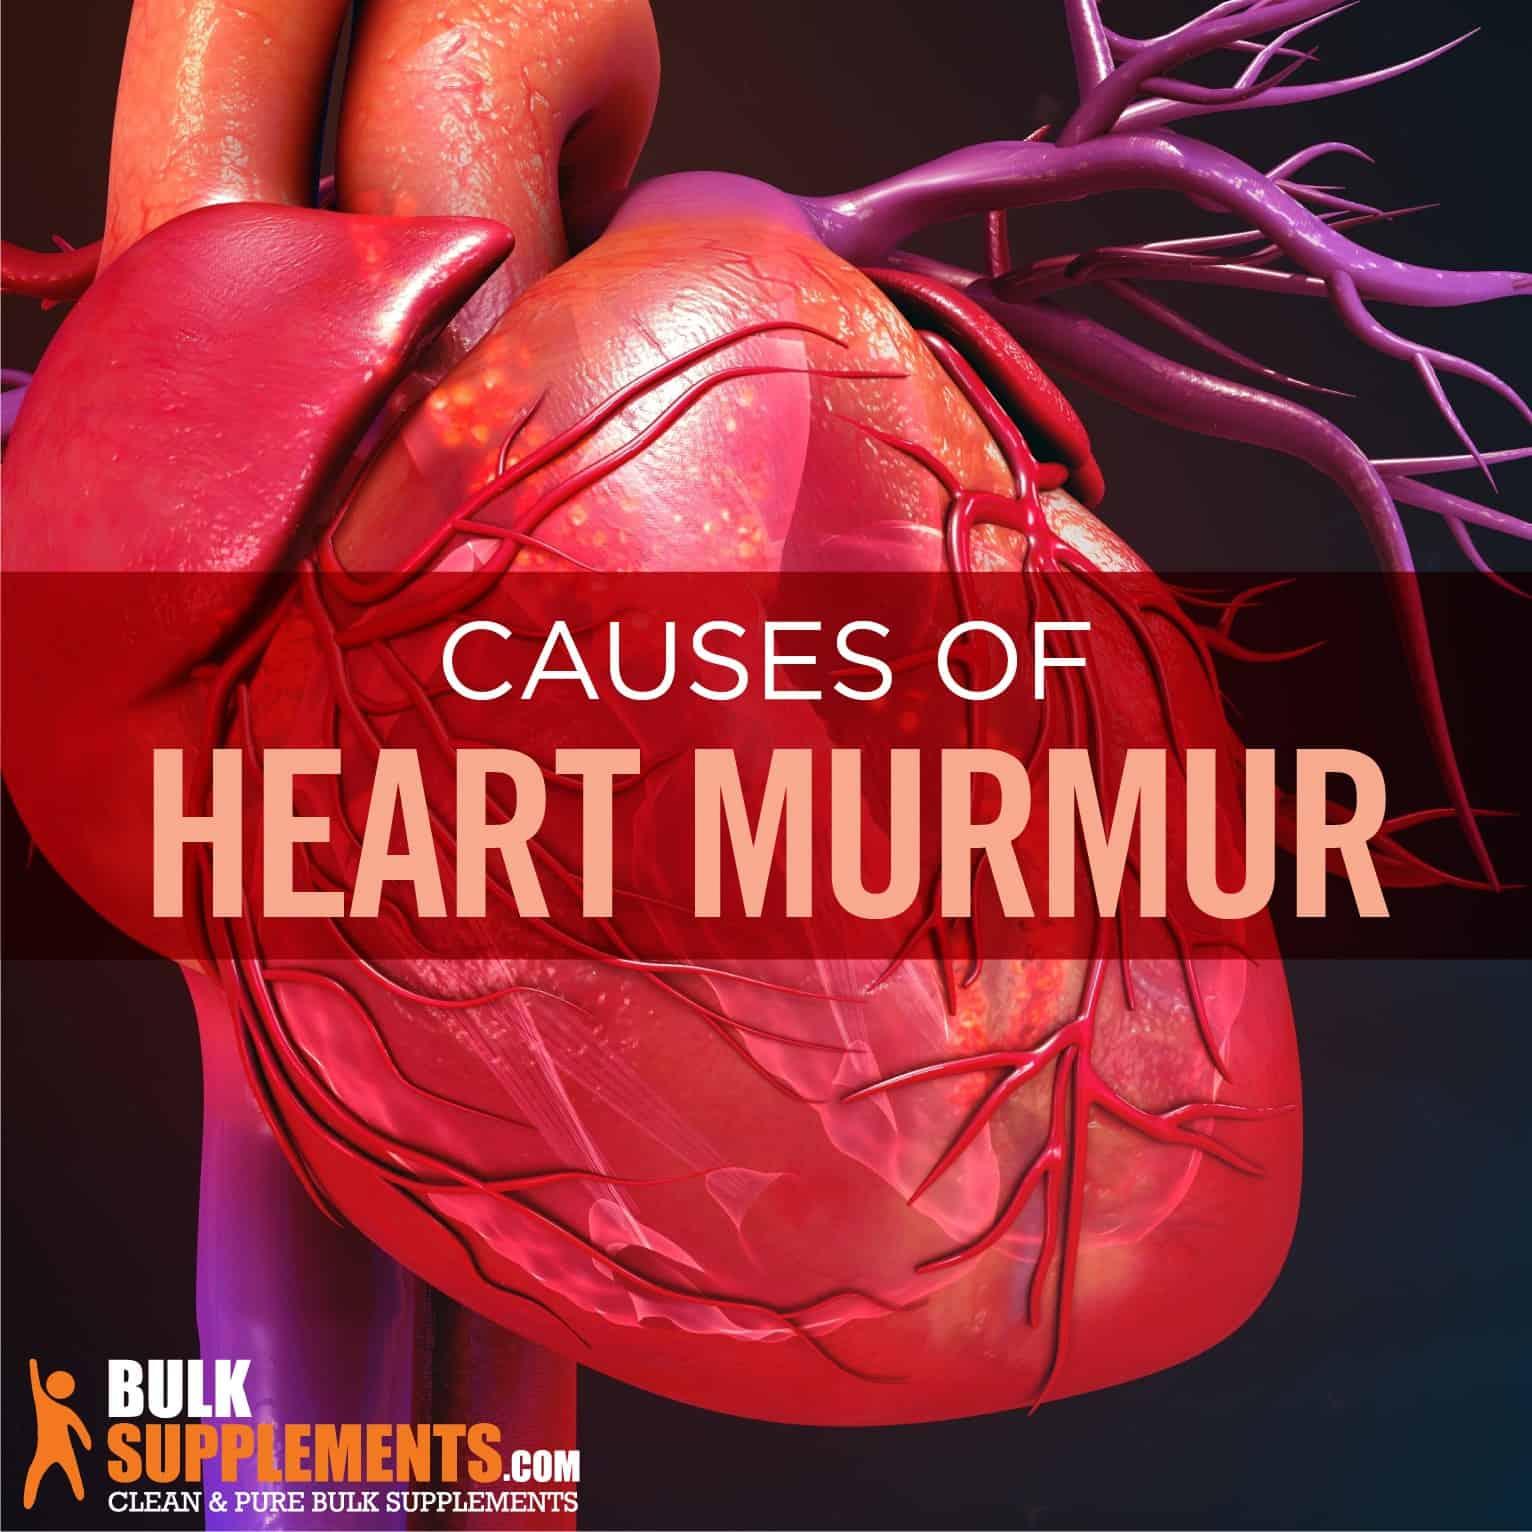 Hantavirus: Symptoms, Causes & Treatment | BulkSupplements.com